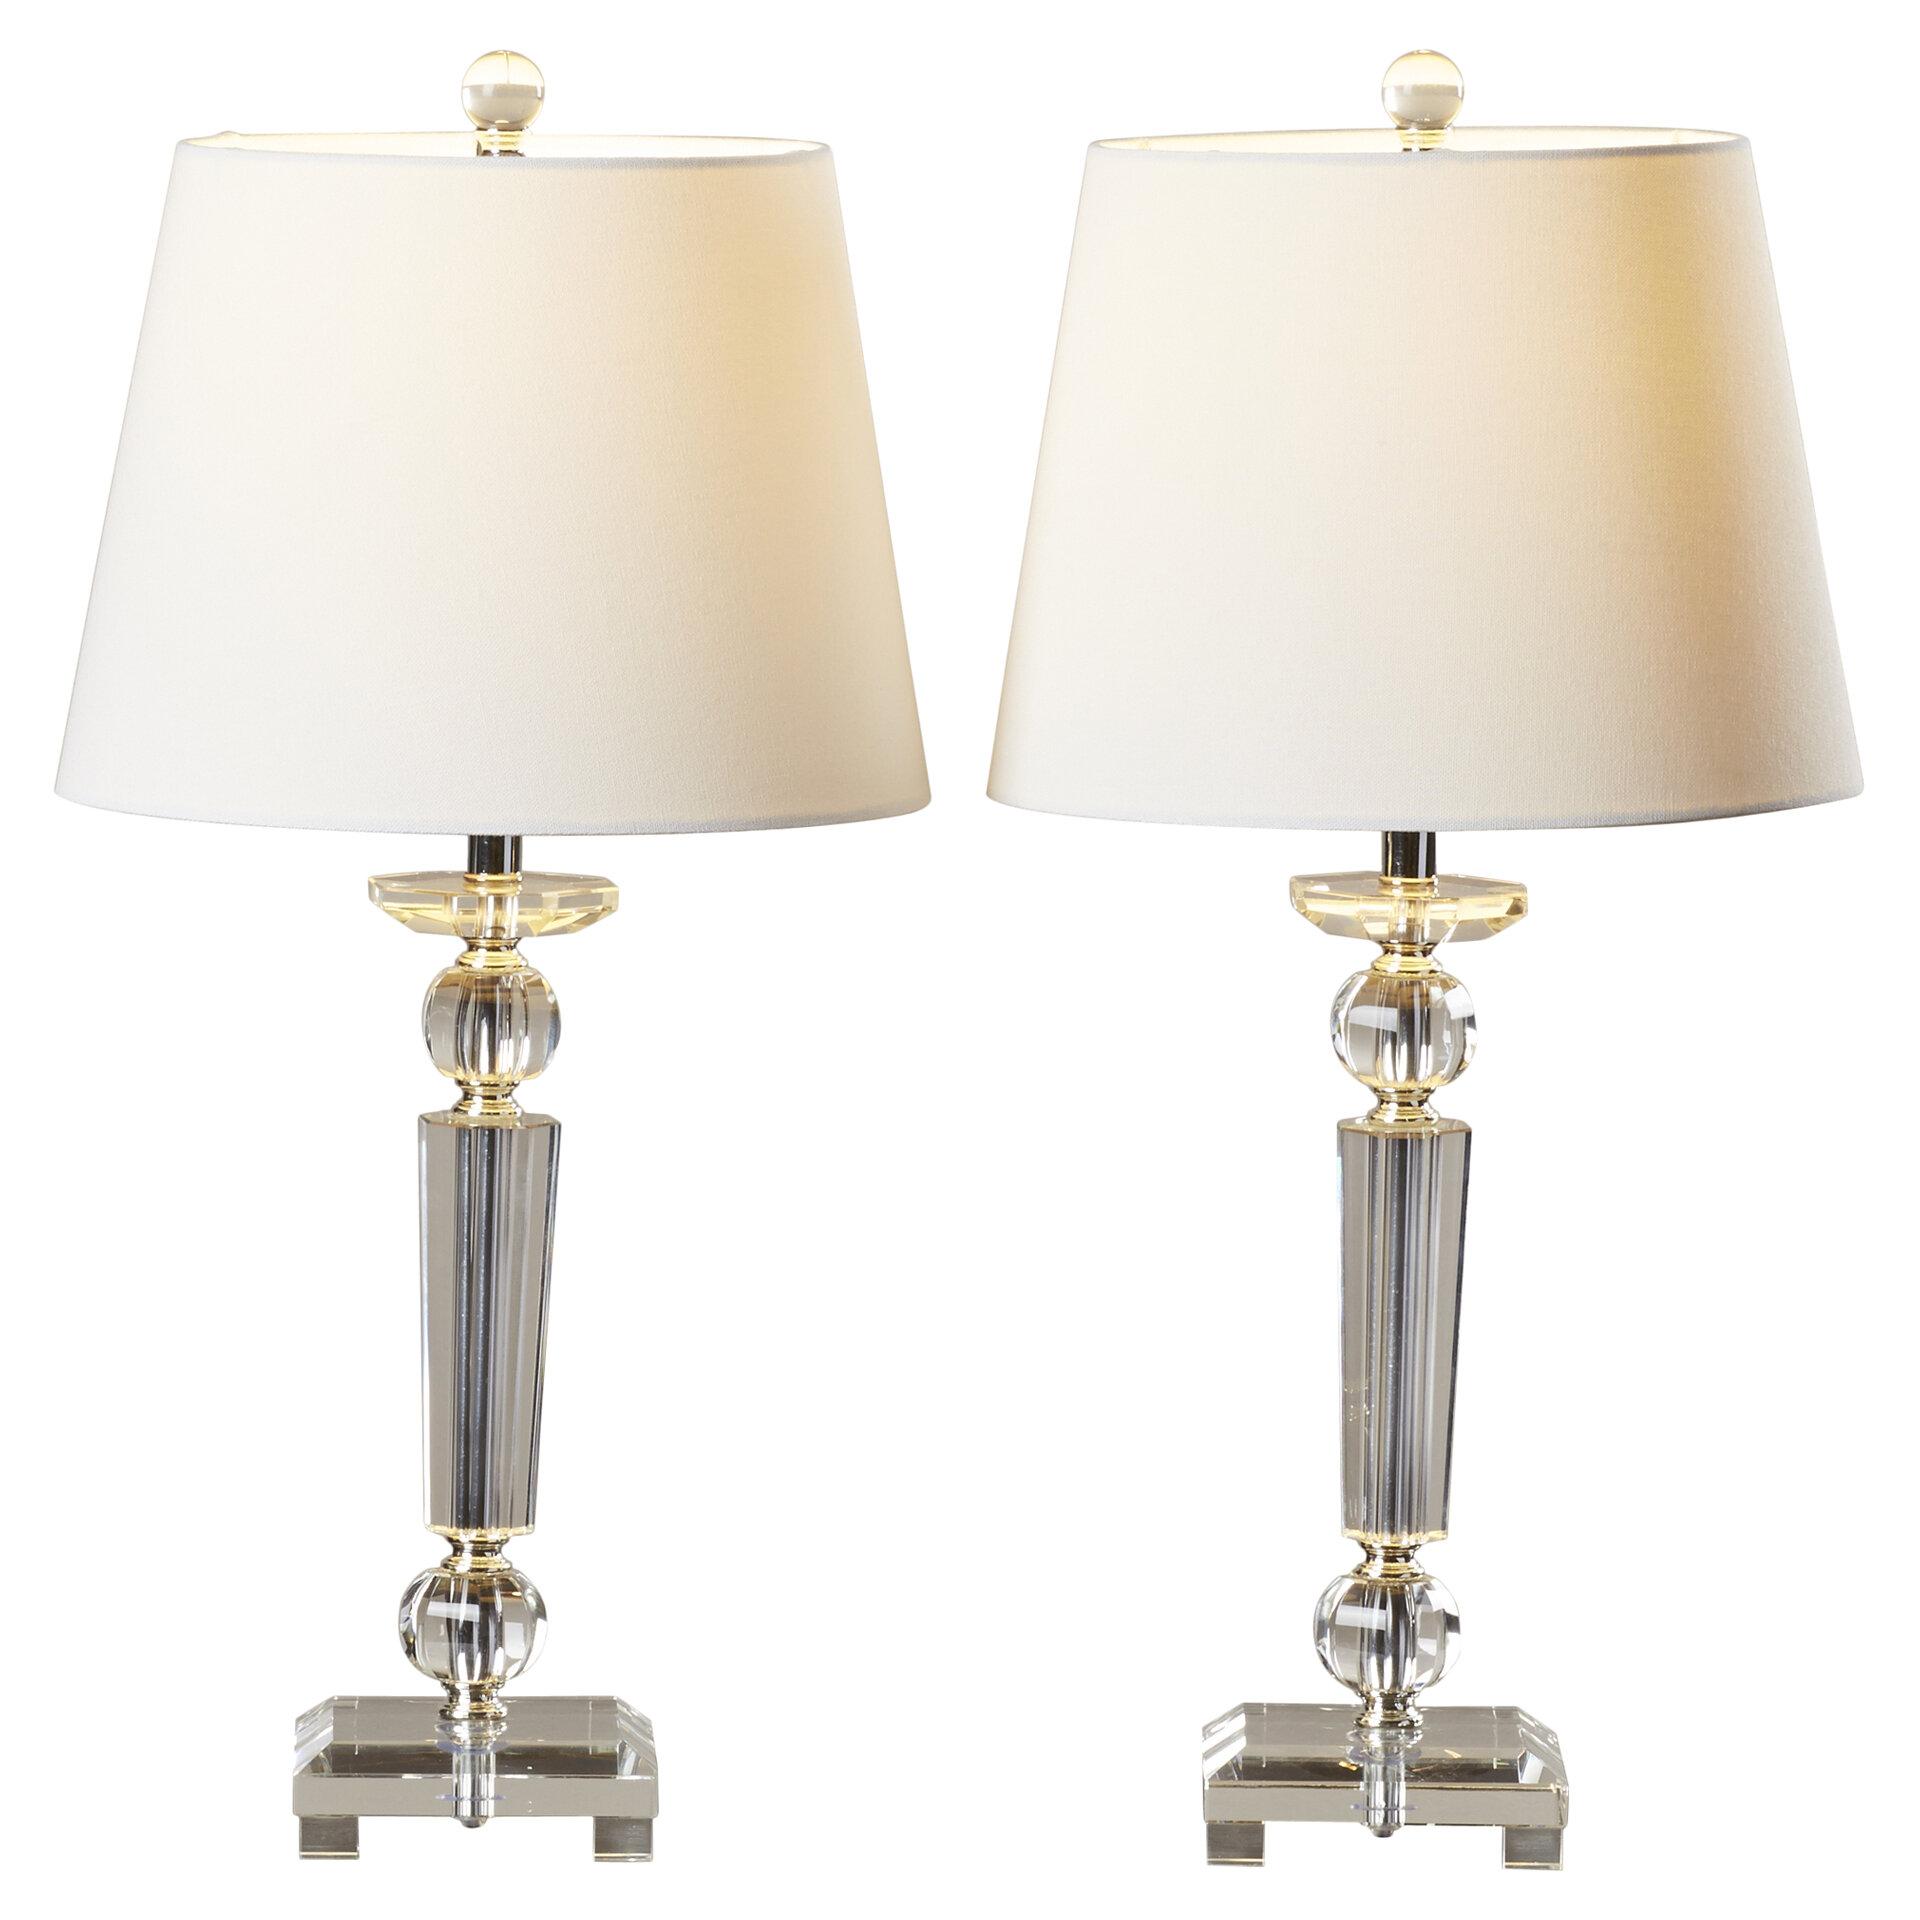 Willem 2 Piece Table Lamp Set